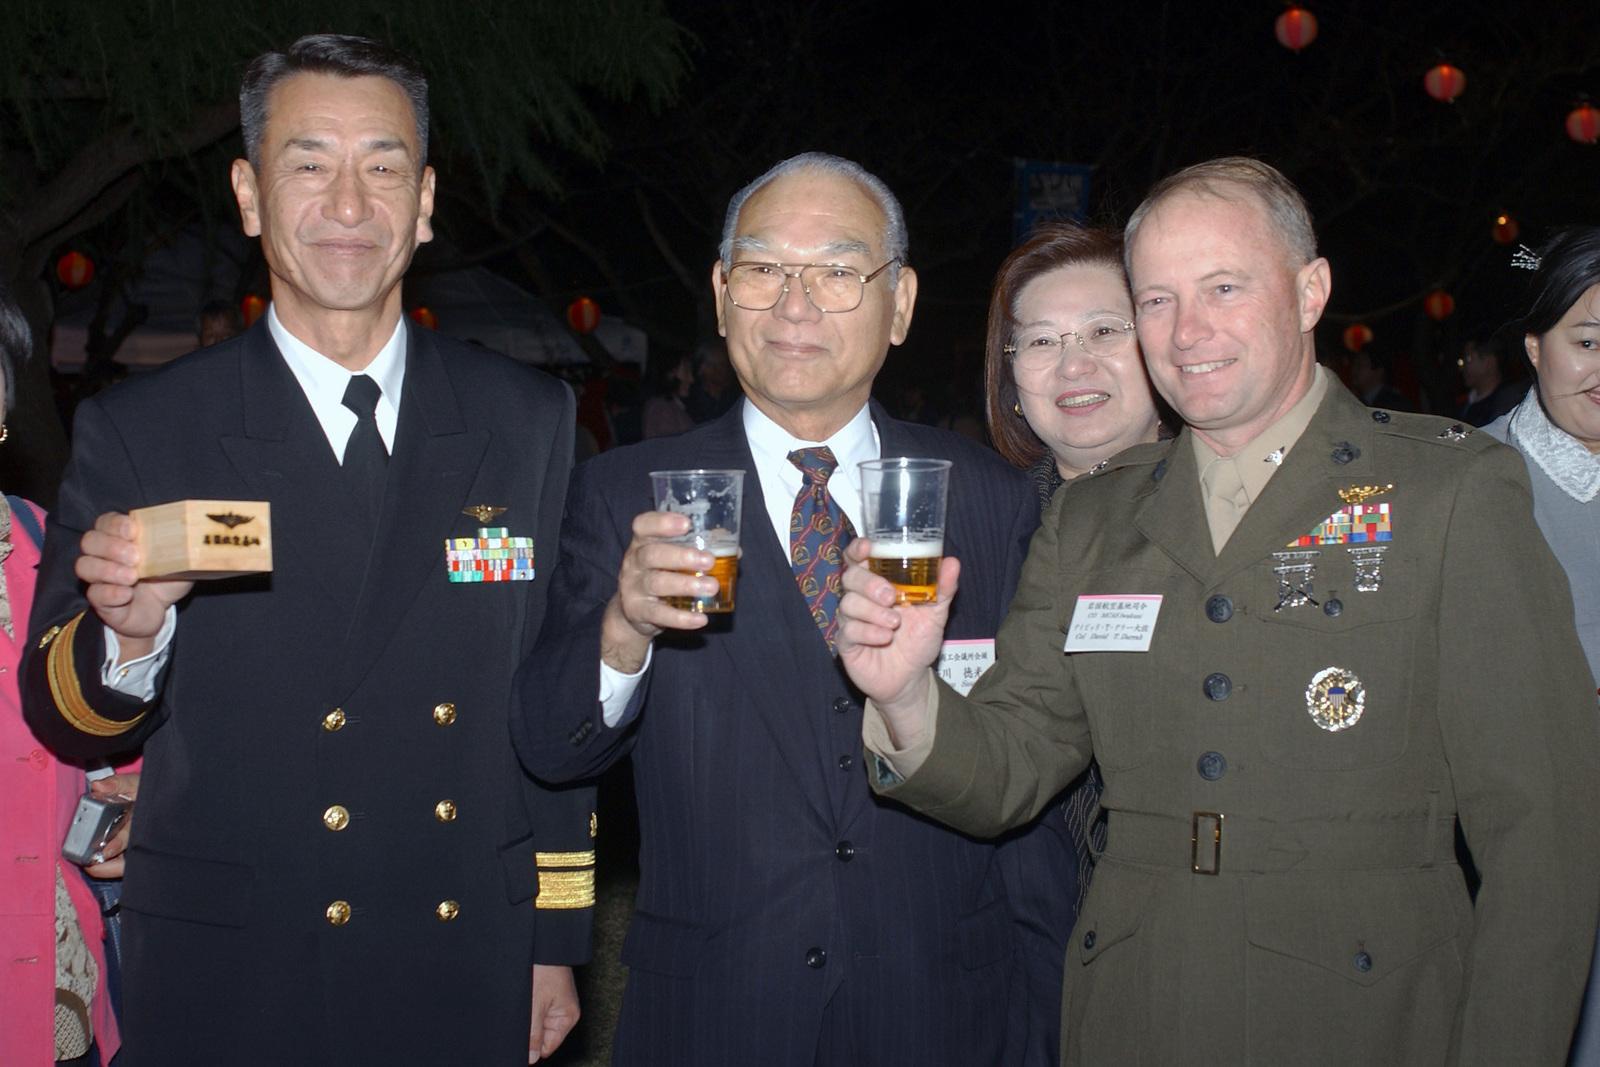 US Marine Corps (USMC) Colonel (COL) David Darrah (right